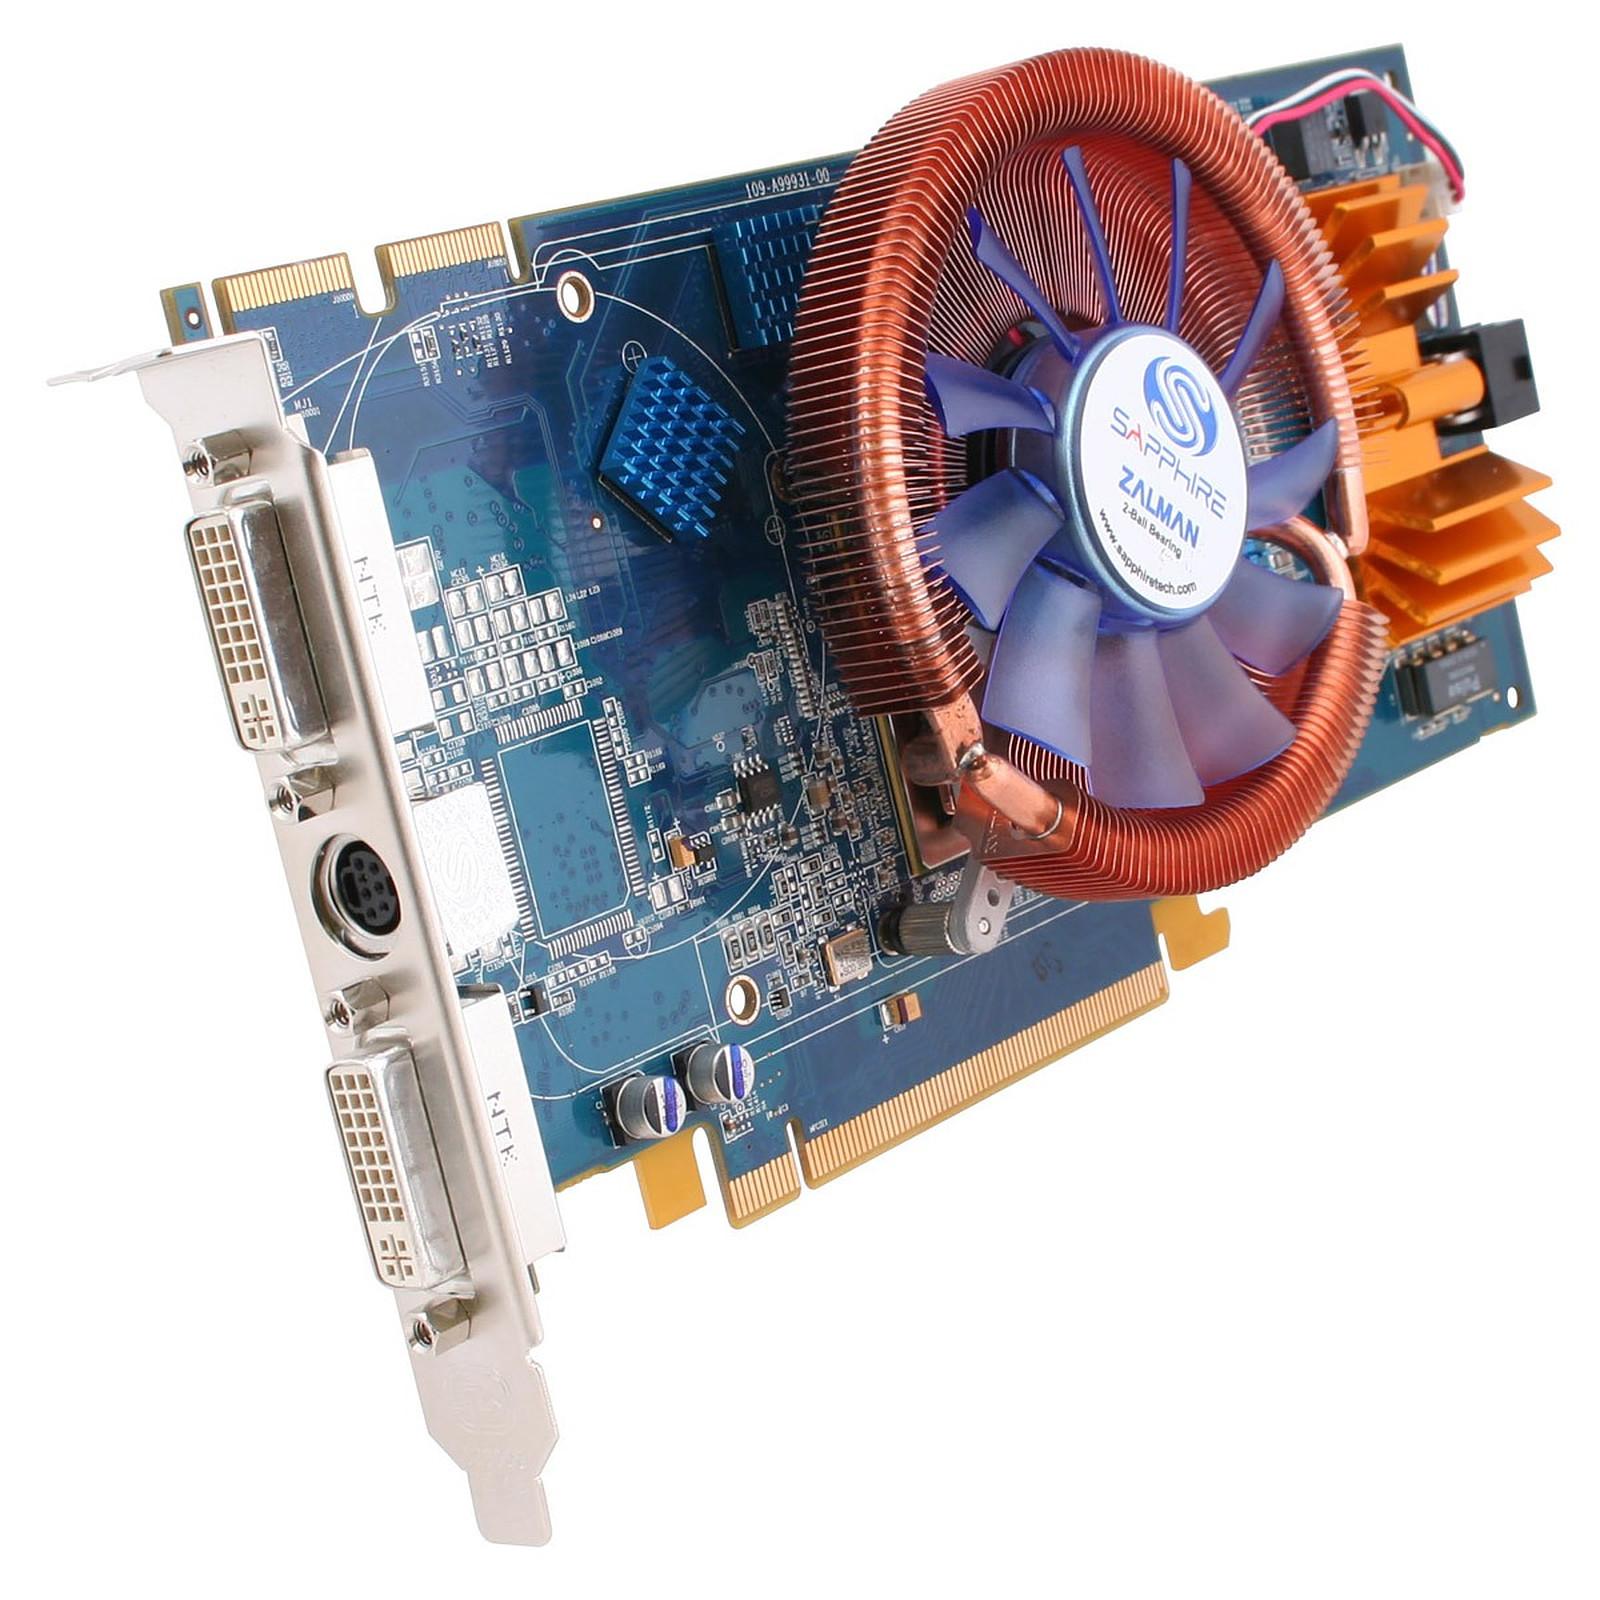 Sapphire Radeon Ultimate X1950 Pro 256 MB